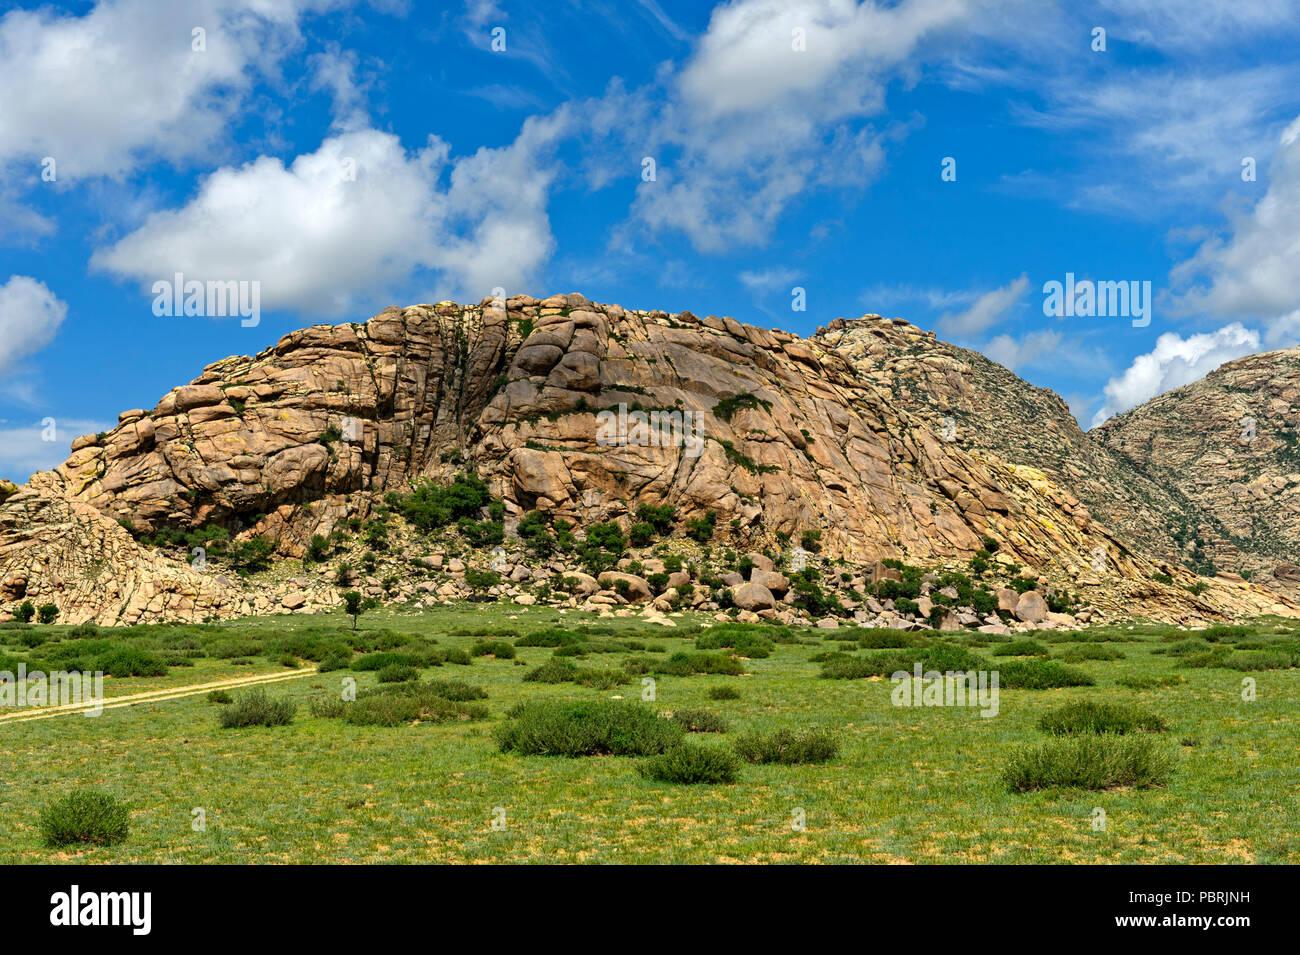 Khugnu Khan Mountains, Khögnö Khan Uul National Park, Bulgan Province, Mongolia - Stock Image